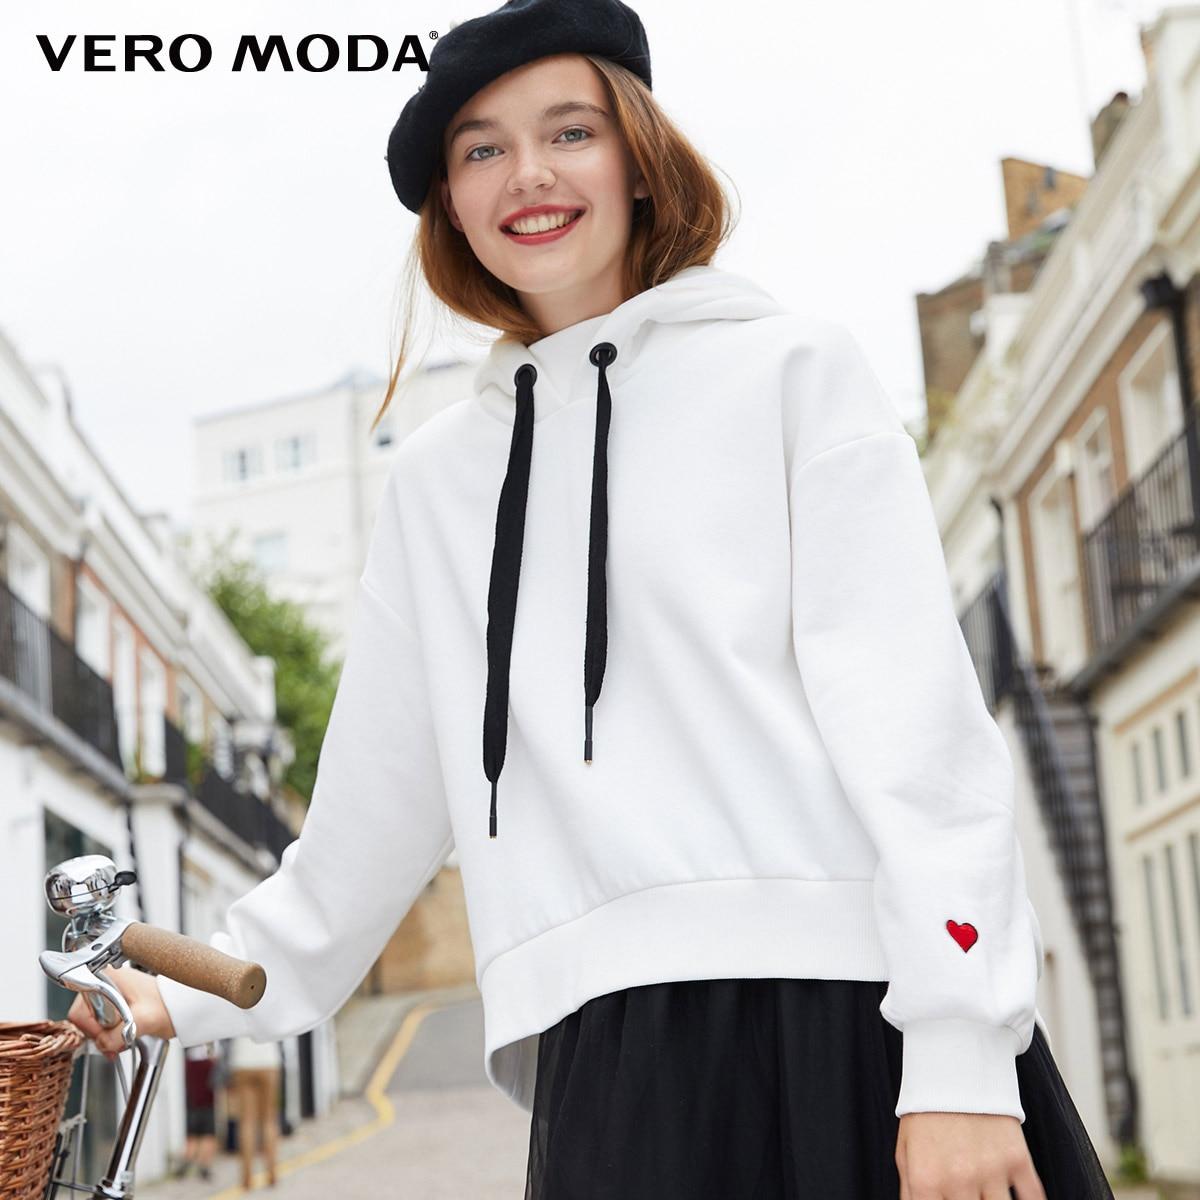 Vero Moda Women's Loose Fit Hooded Drawstring Embroidered Hoodie Sweatshirt | 319133509